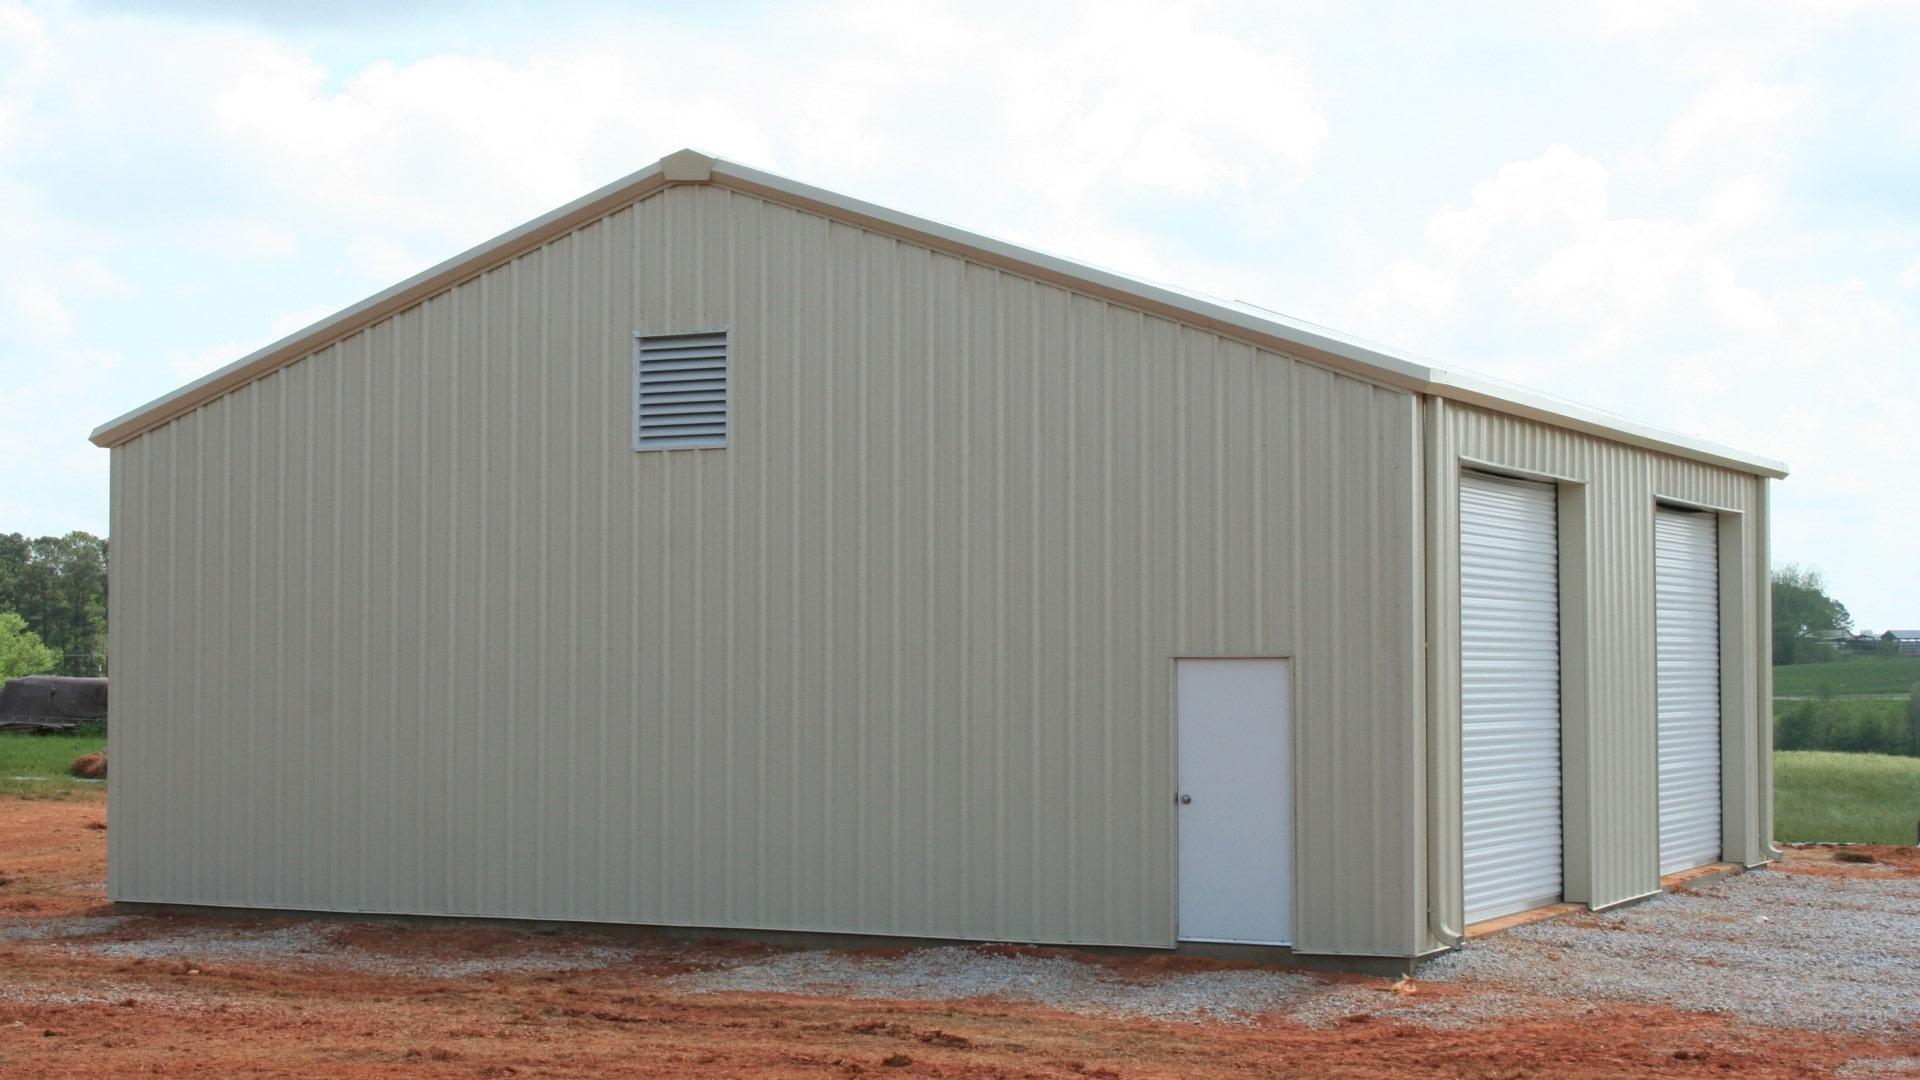 Tan metal garage with tan trim, rollup doors, walk door, and louver vent. View from left endwall.